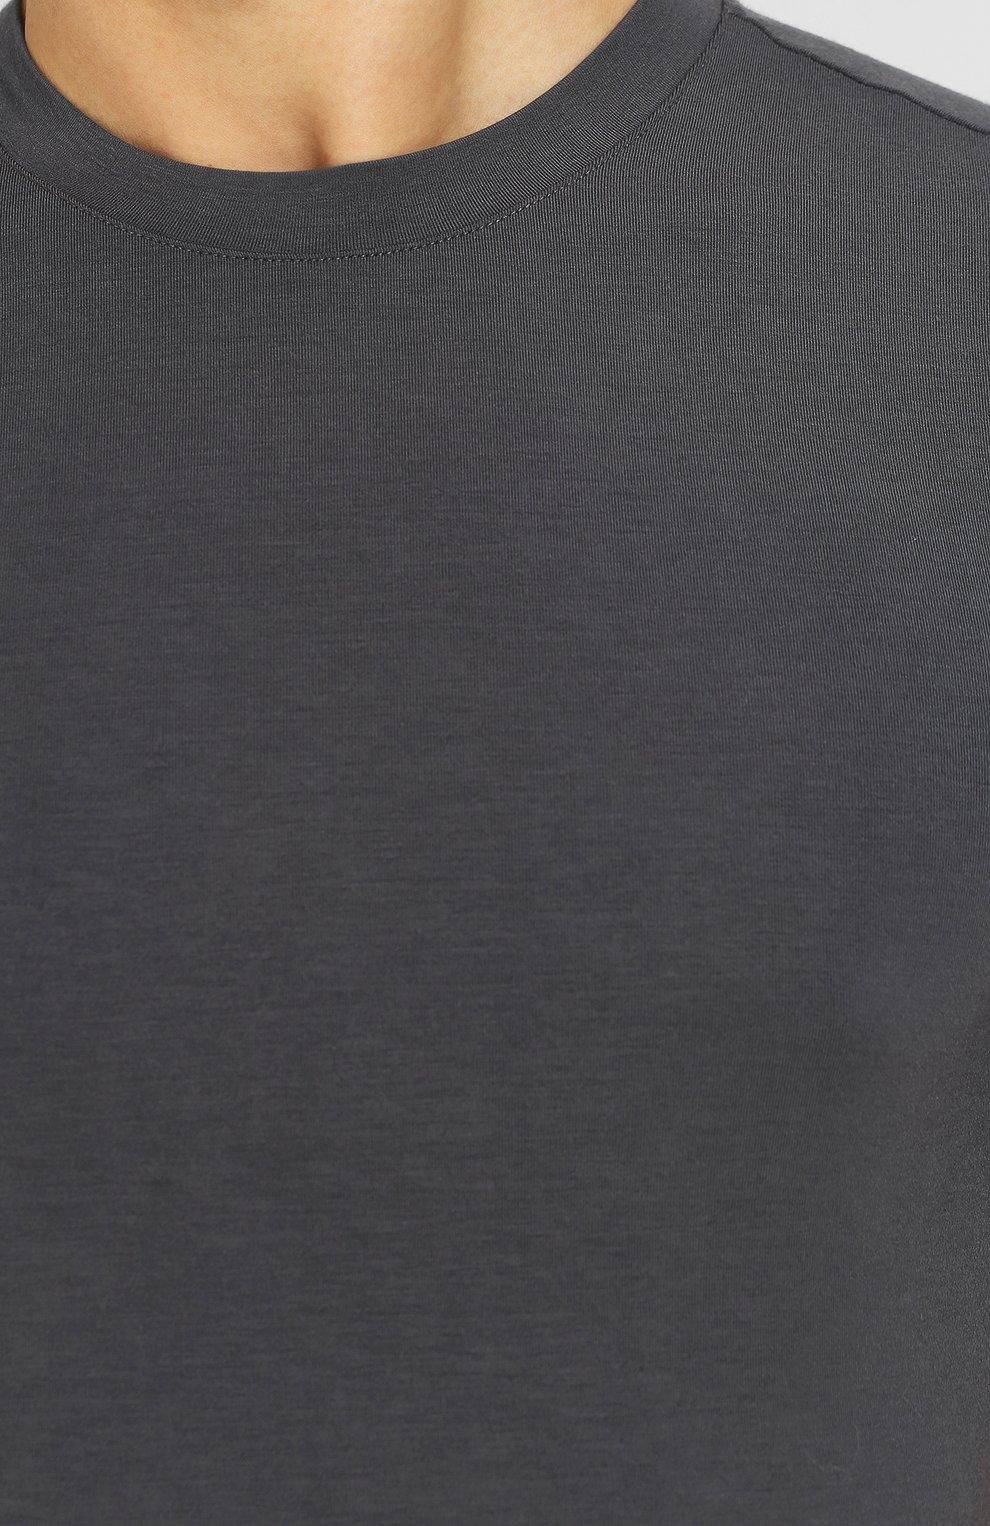 Мужская однотонная футболка из вискозы GIORGIO ARMANI серого цвета, арт. 8NST52/SJP4Z | Фото 5